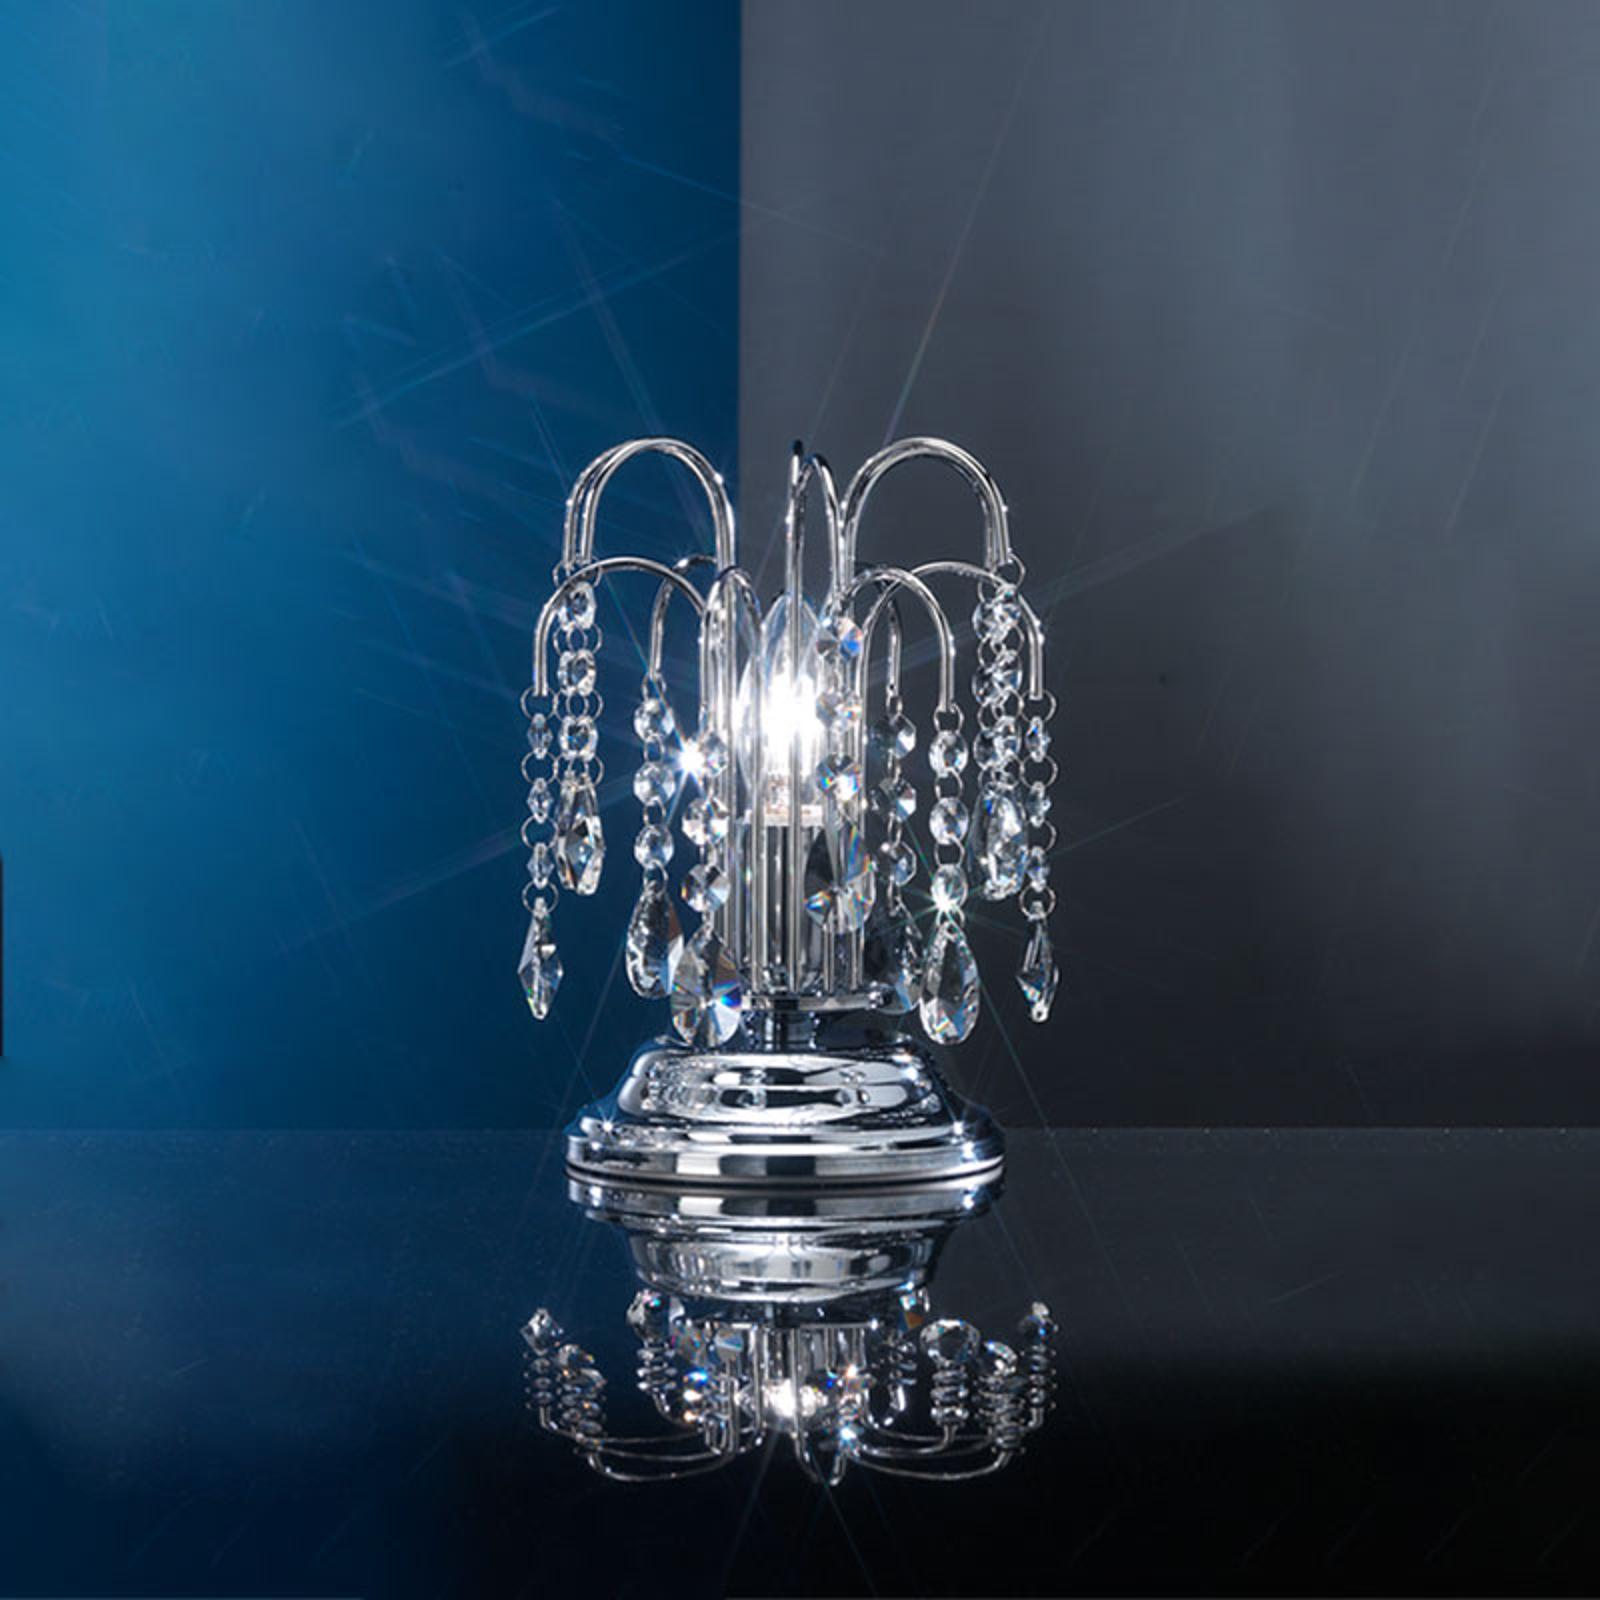 Pioggia bordlampe med krystalregn, 26 cm, krom